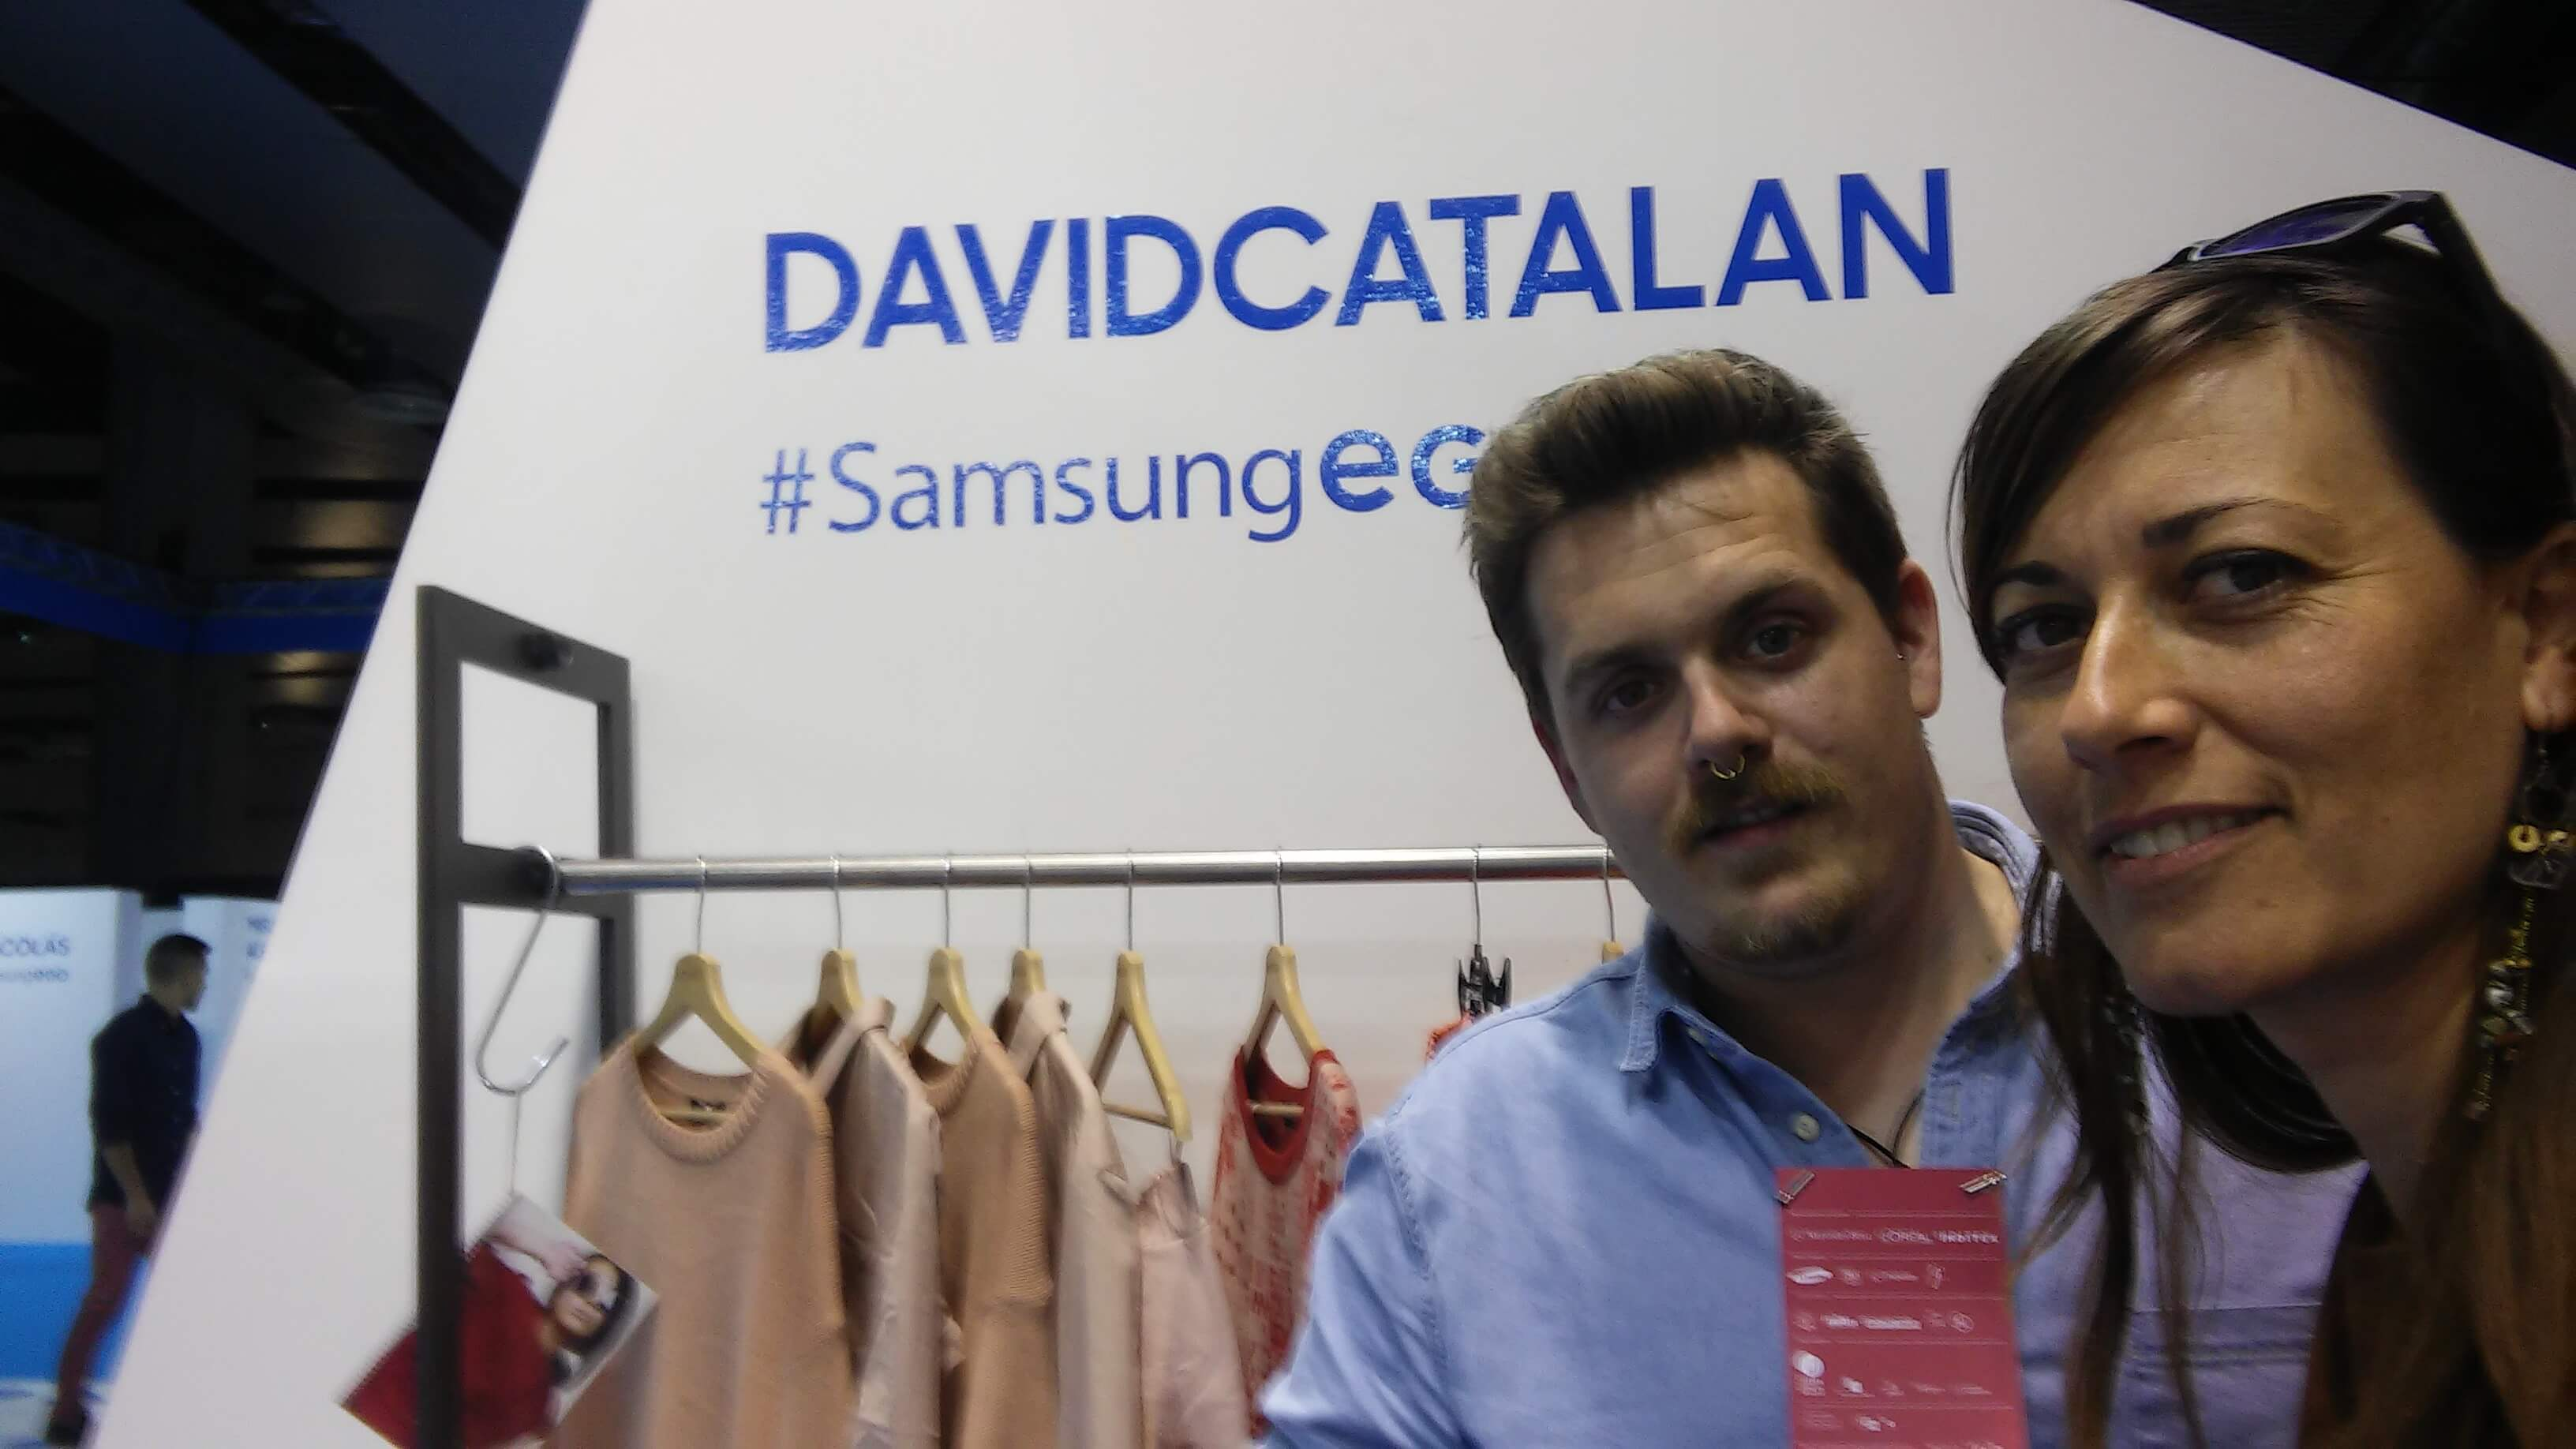 2015-09-19 DAVID CATALÁN